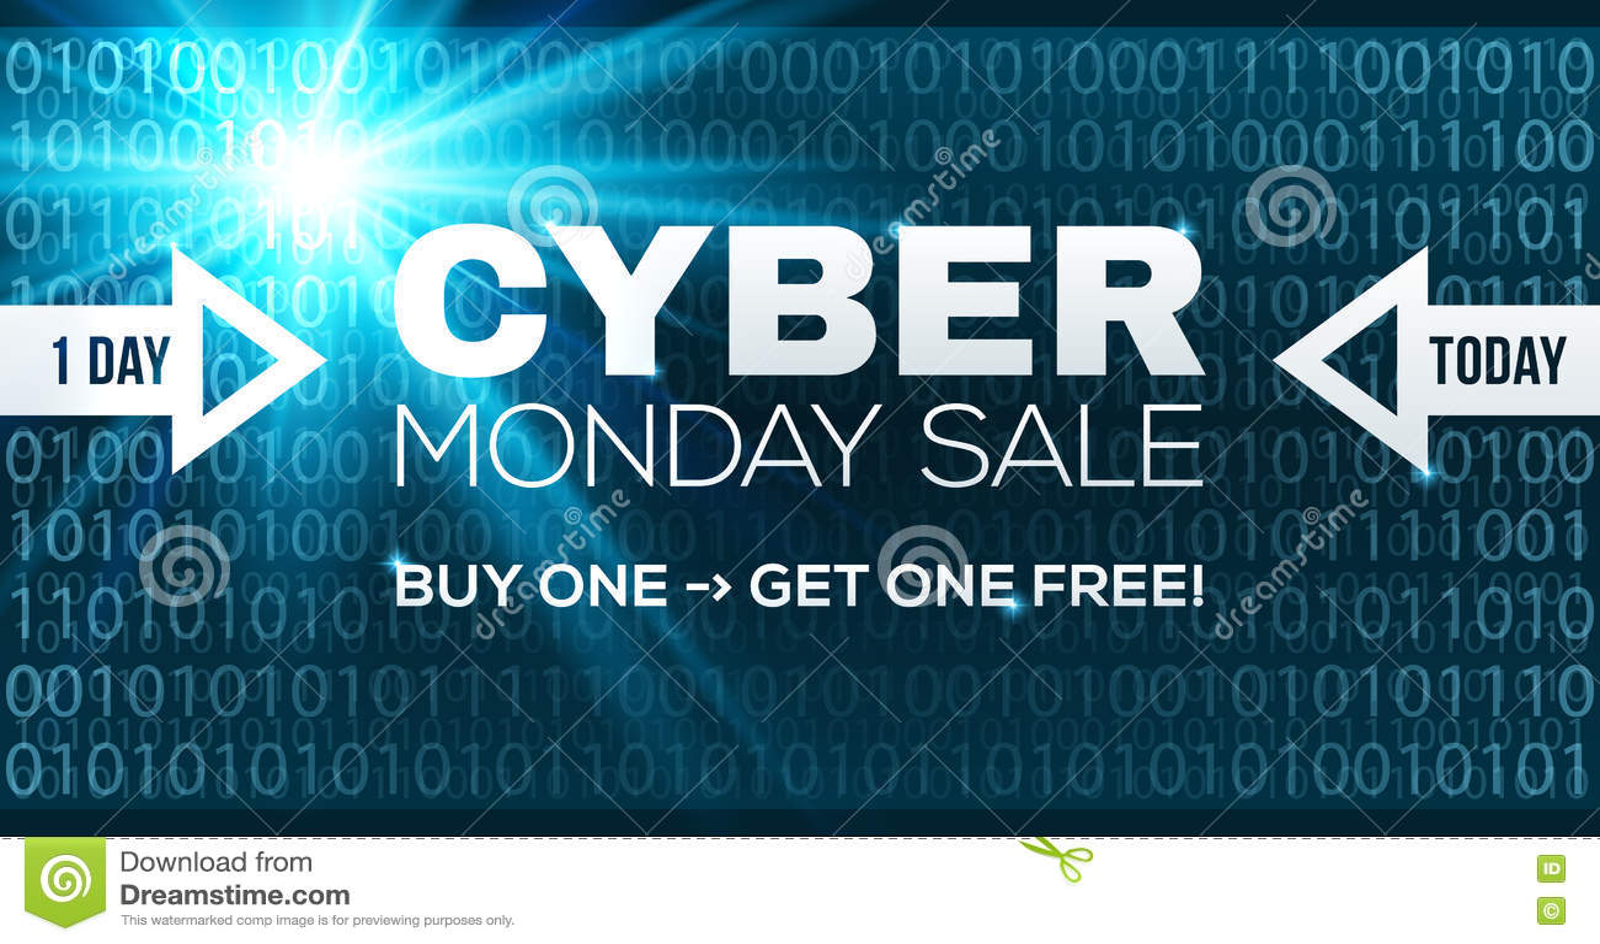 32f9127da04 Cyber Monday Sale Vector Banner Template. Stock Vector ...